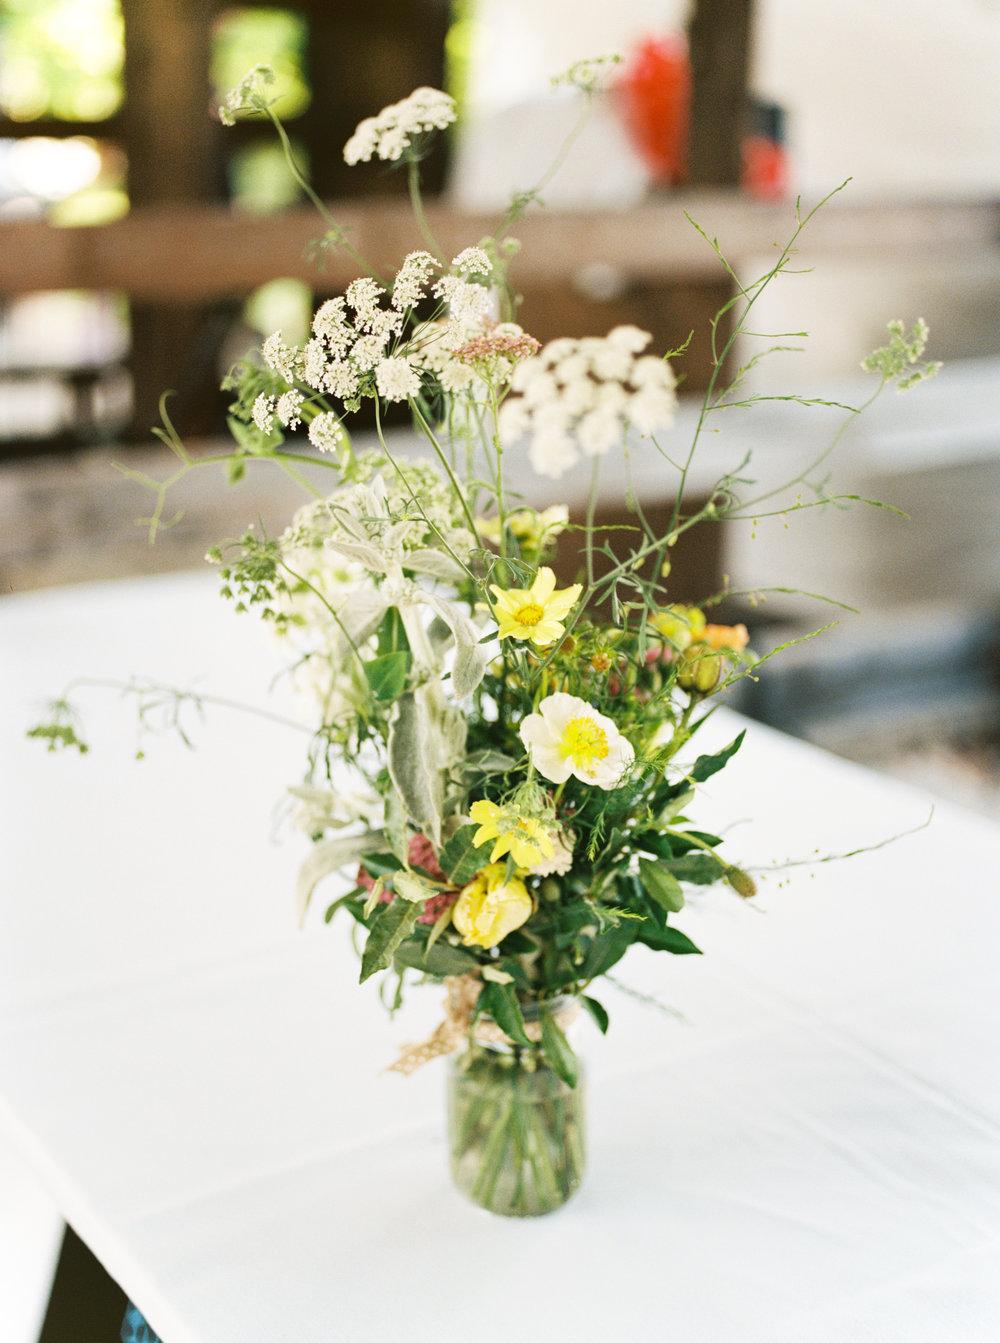 ithaca-farmers-market-wedding-haley-richter-photography-133.jpg